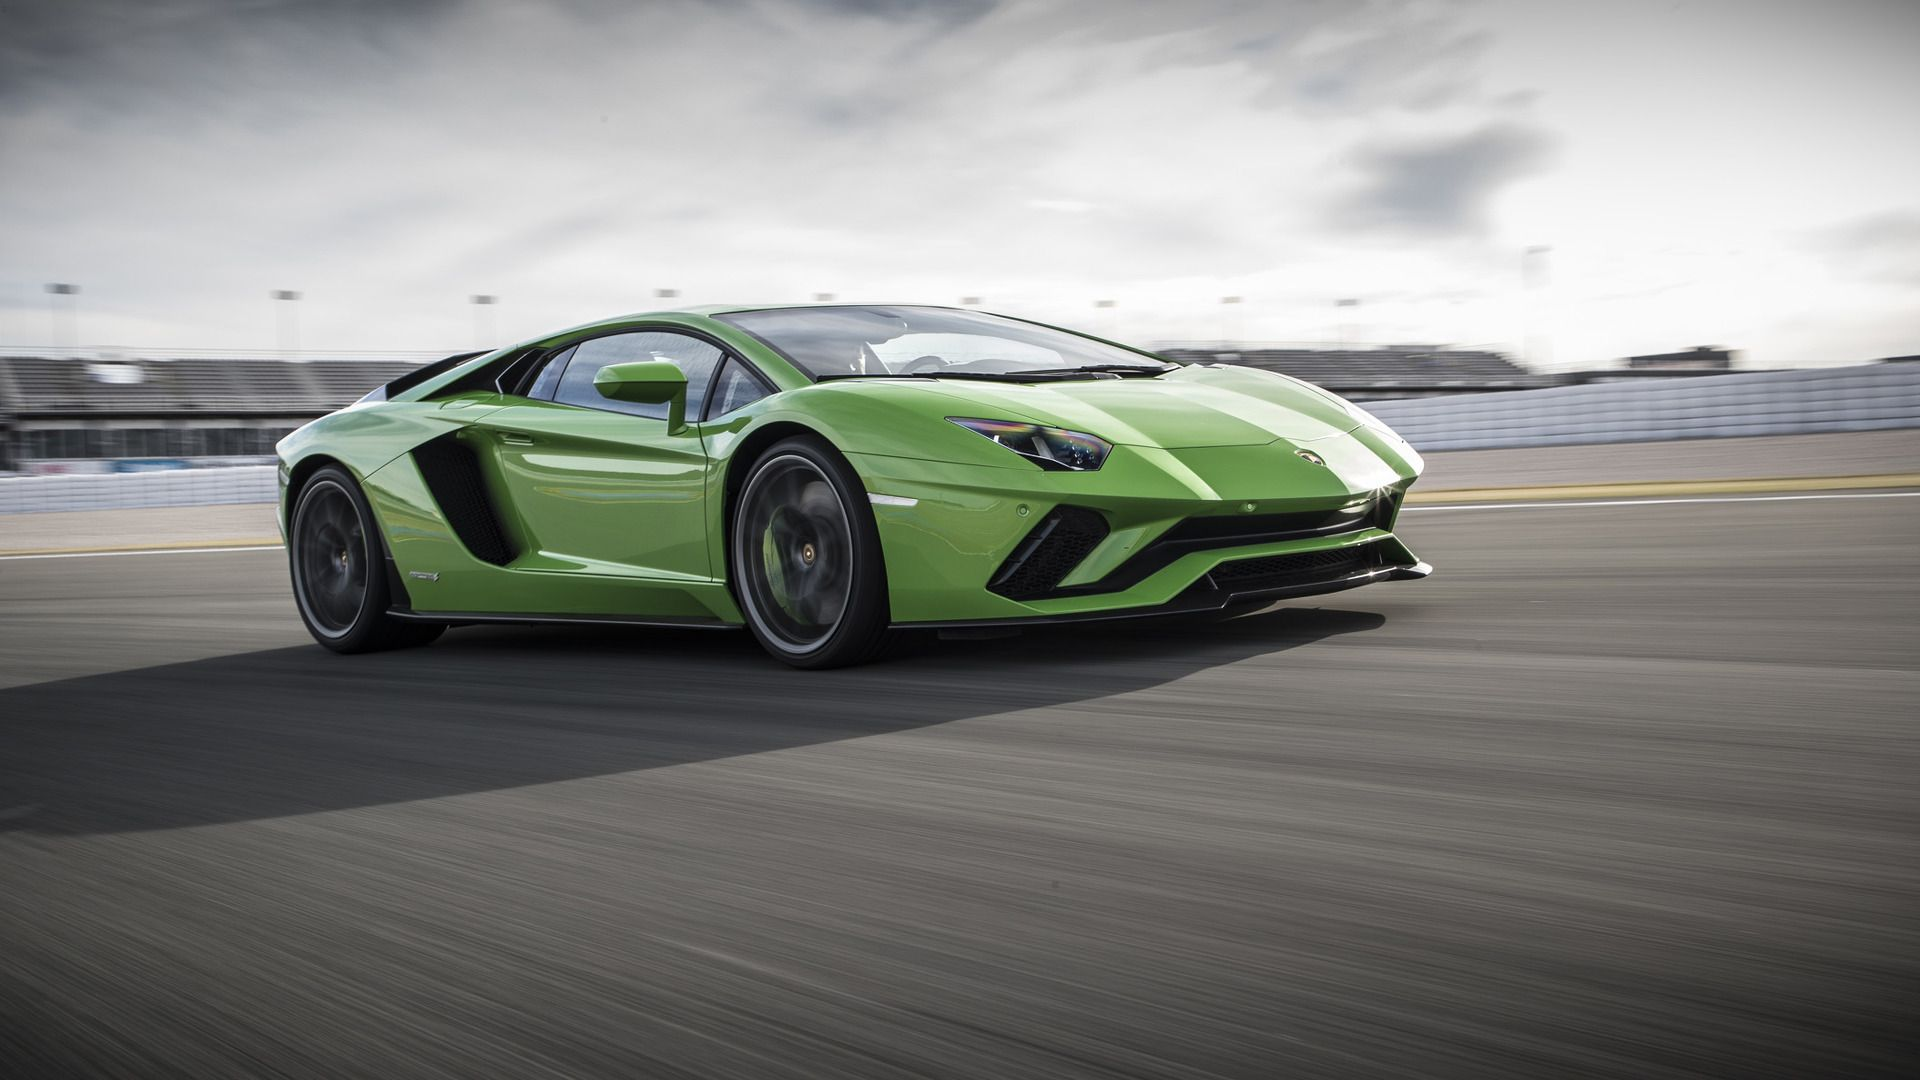 Exceptional Http://icdn 6.motor1.com/images/mgl/00222/s1/2017 Lamborghini Aventador S Coupe  | Lamborghini | Pinterest | Lamborghini And Cars